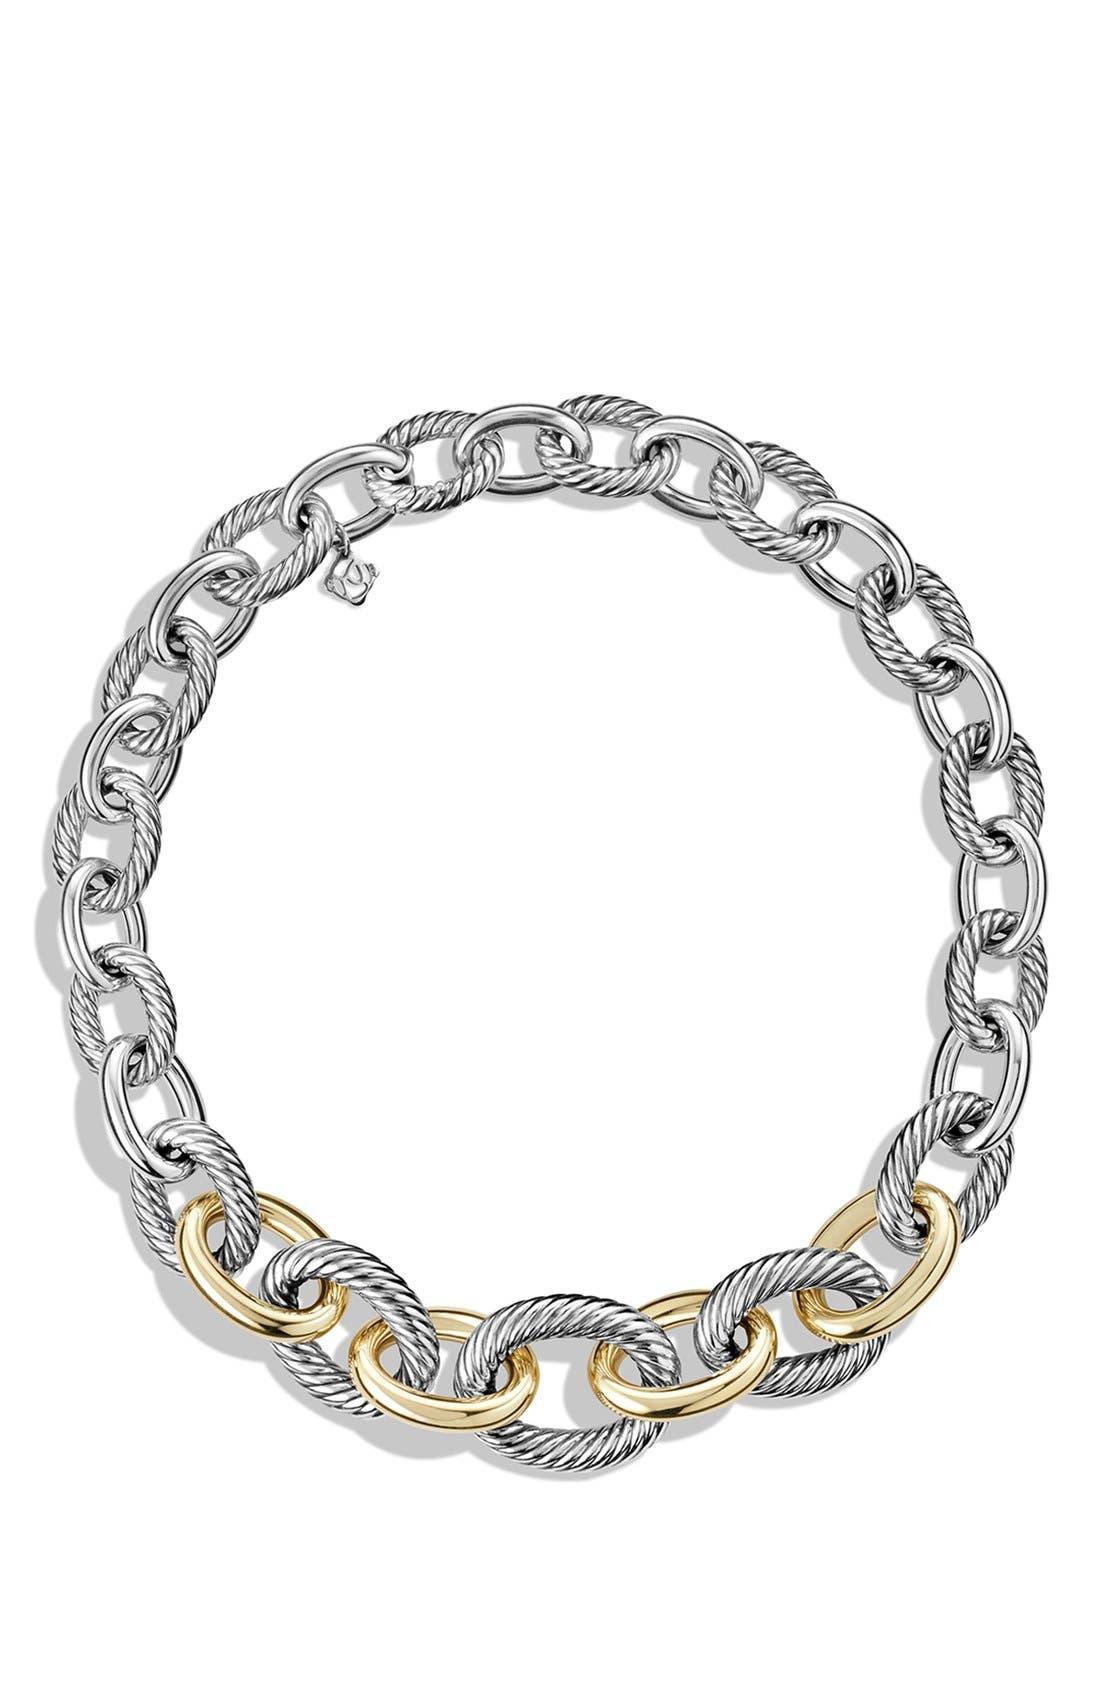 DAVID YURMAN 'Chain' Medium Oval Necklace with 14K